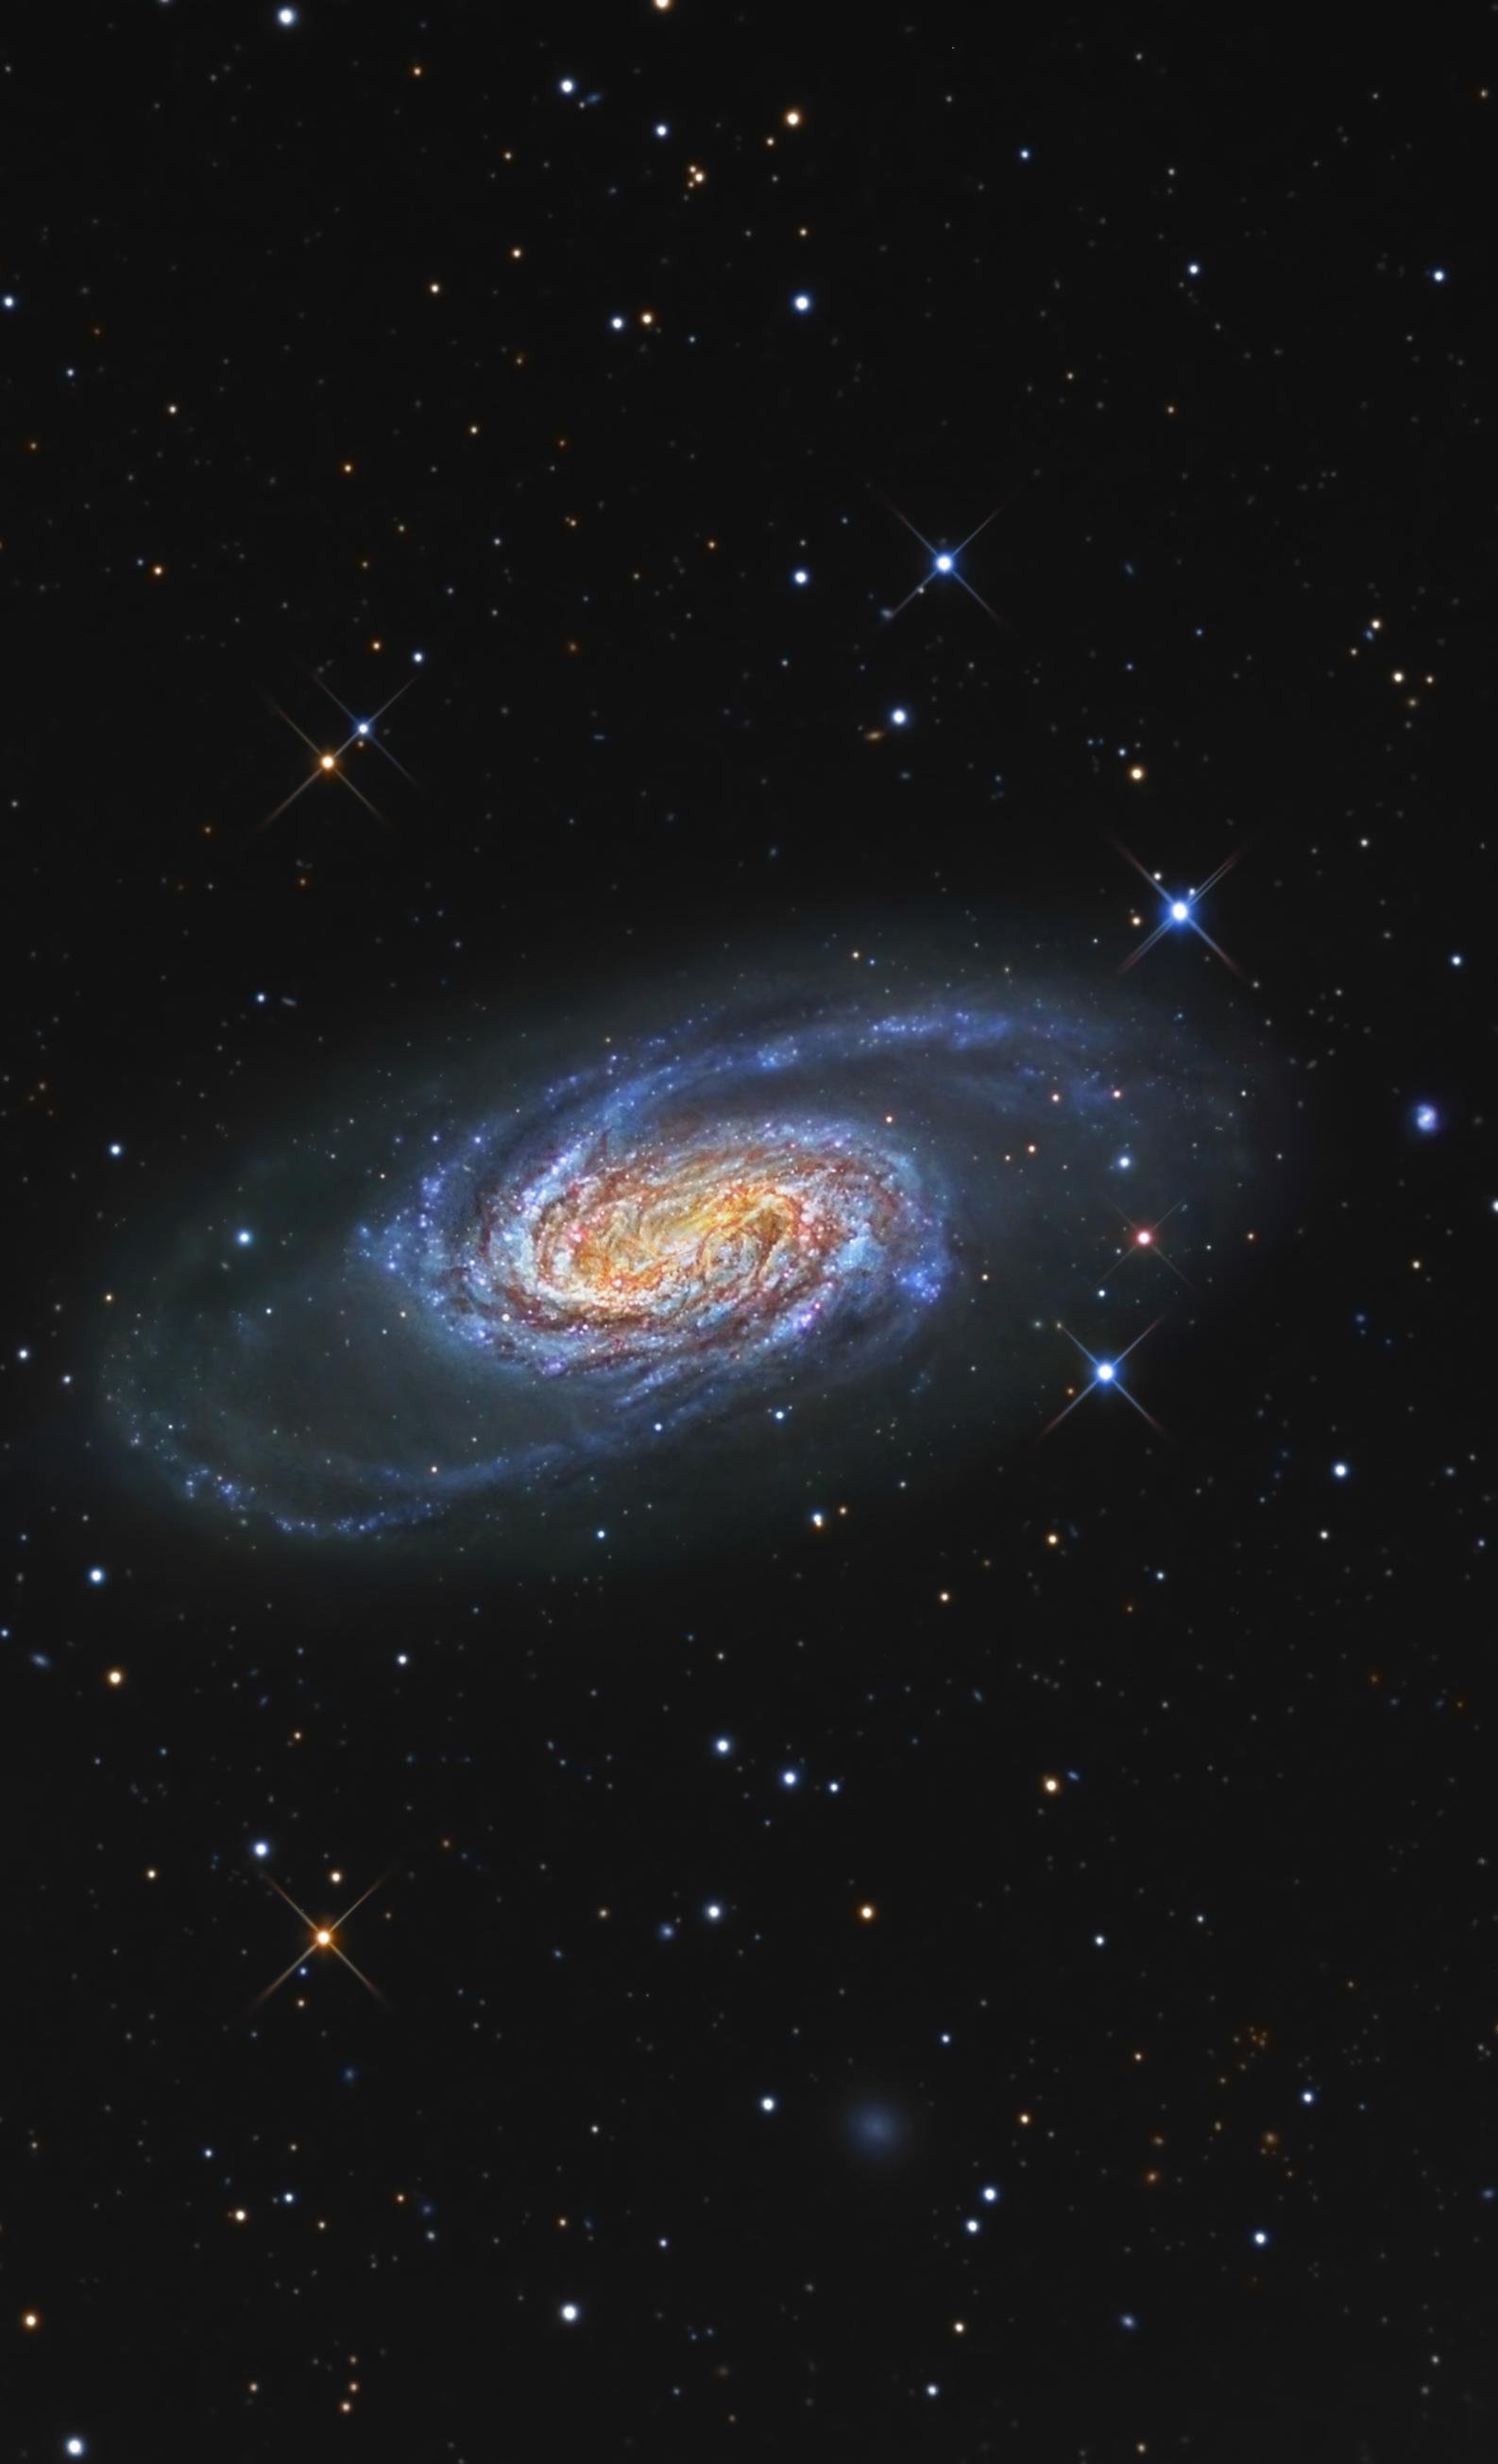 Bright Galaxy NGC 2903